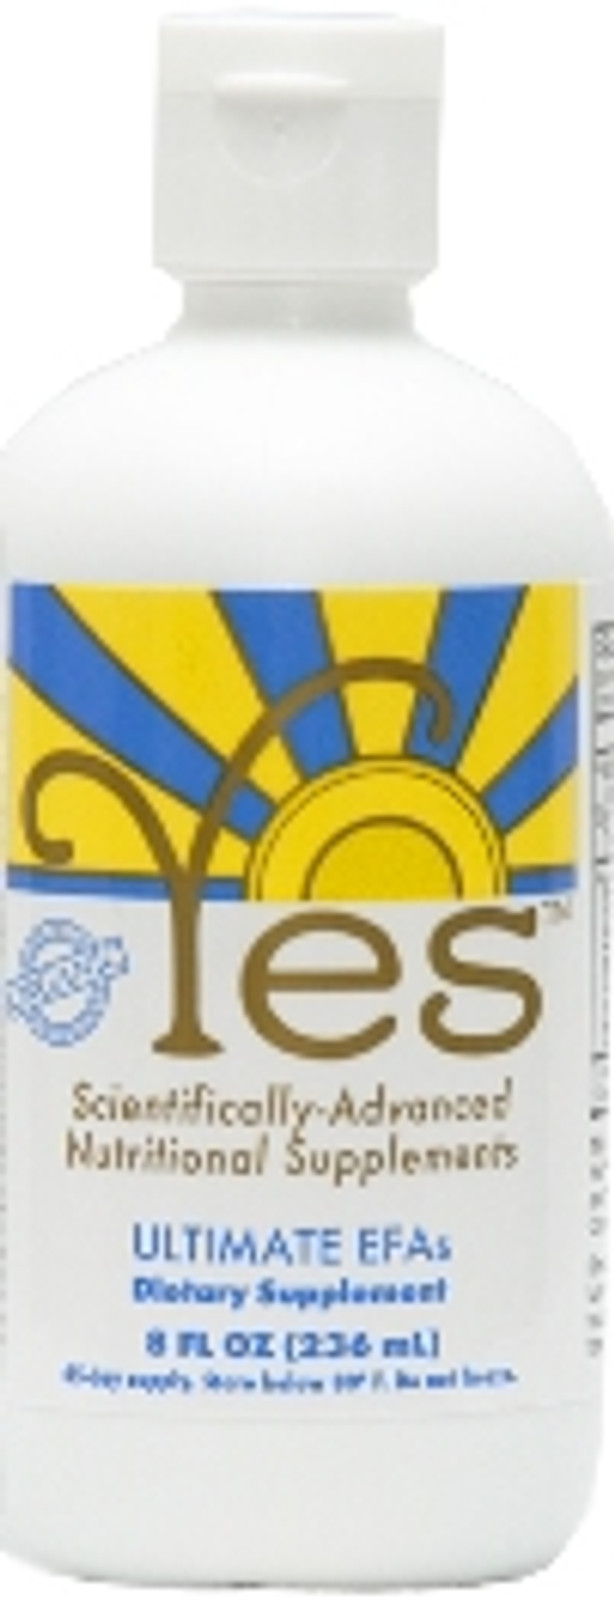 Yes 1 Month Supply - Liquid EFA, Liquid Herbal, Mineral Caps